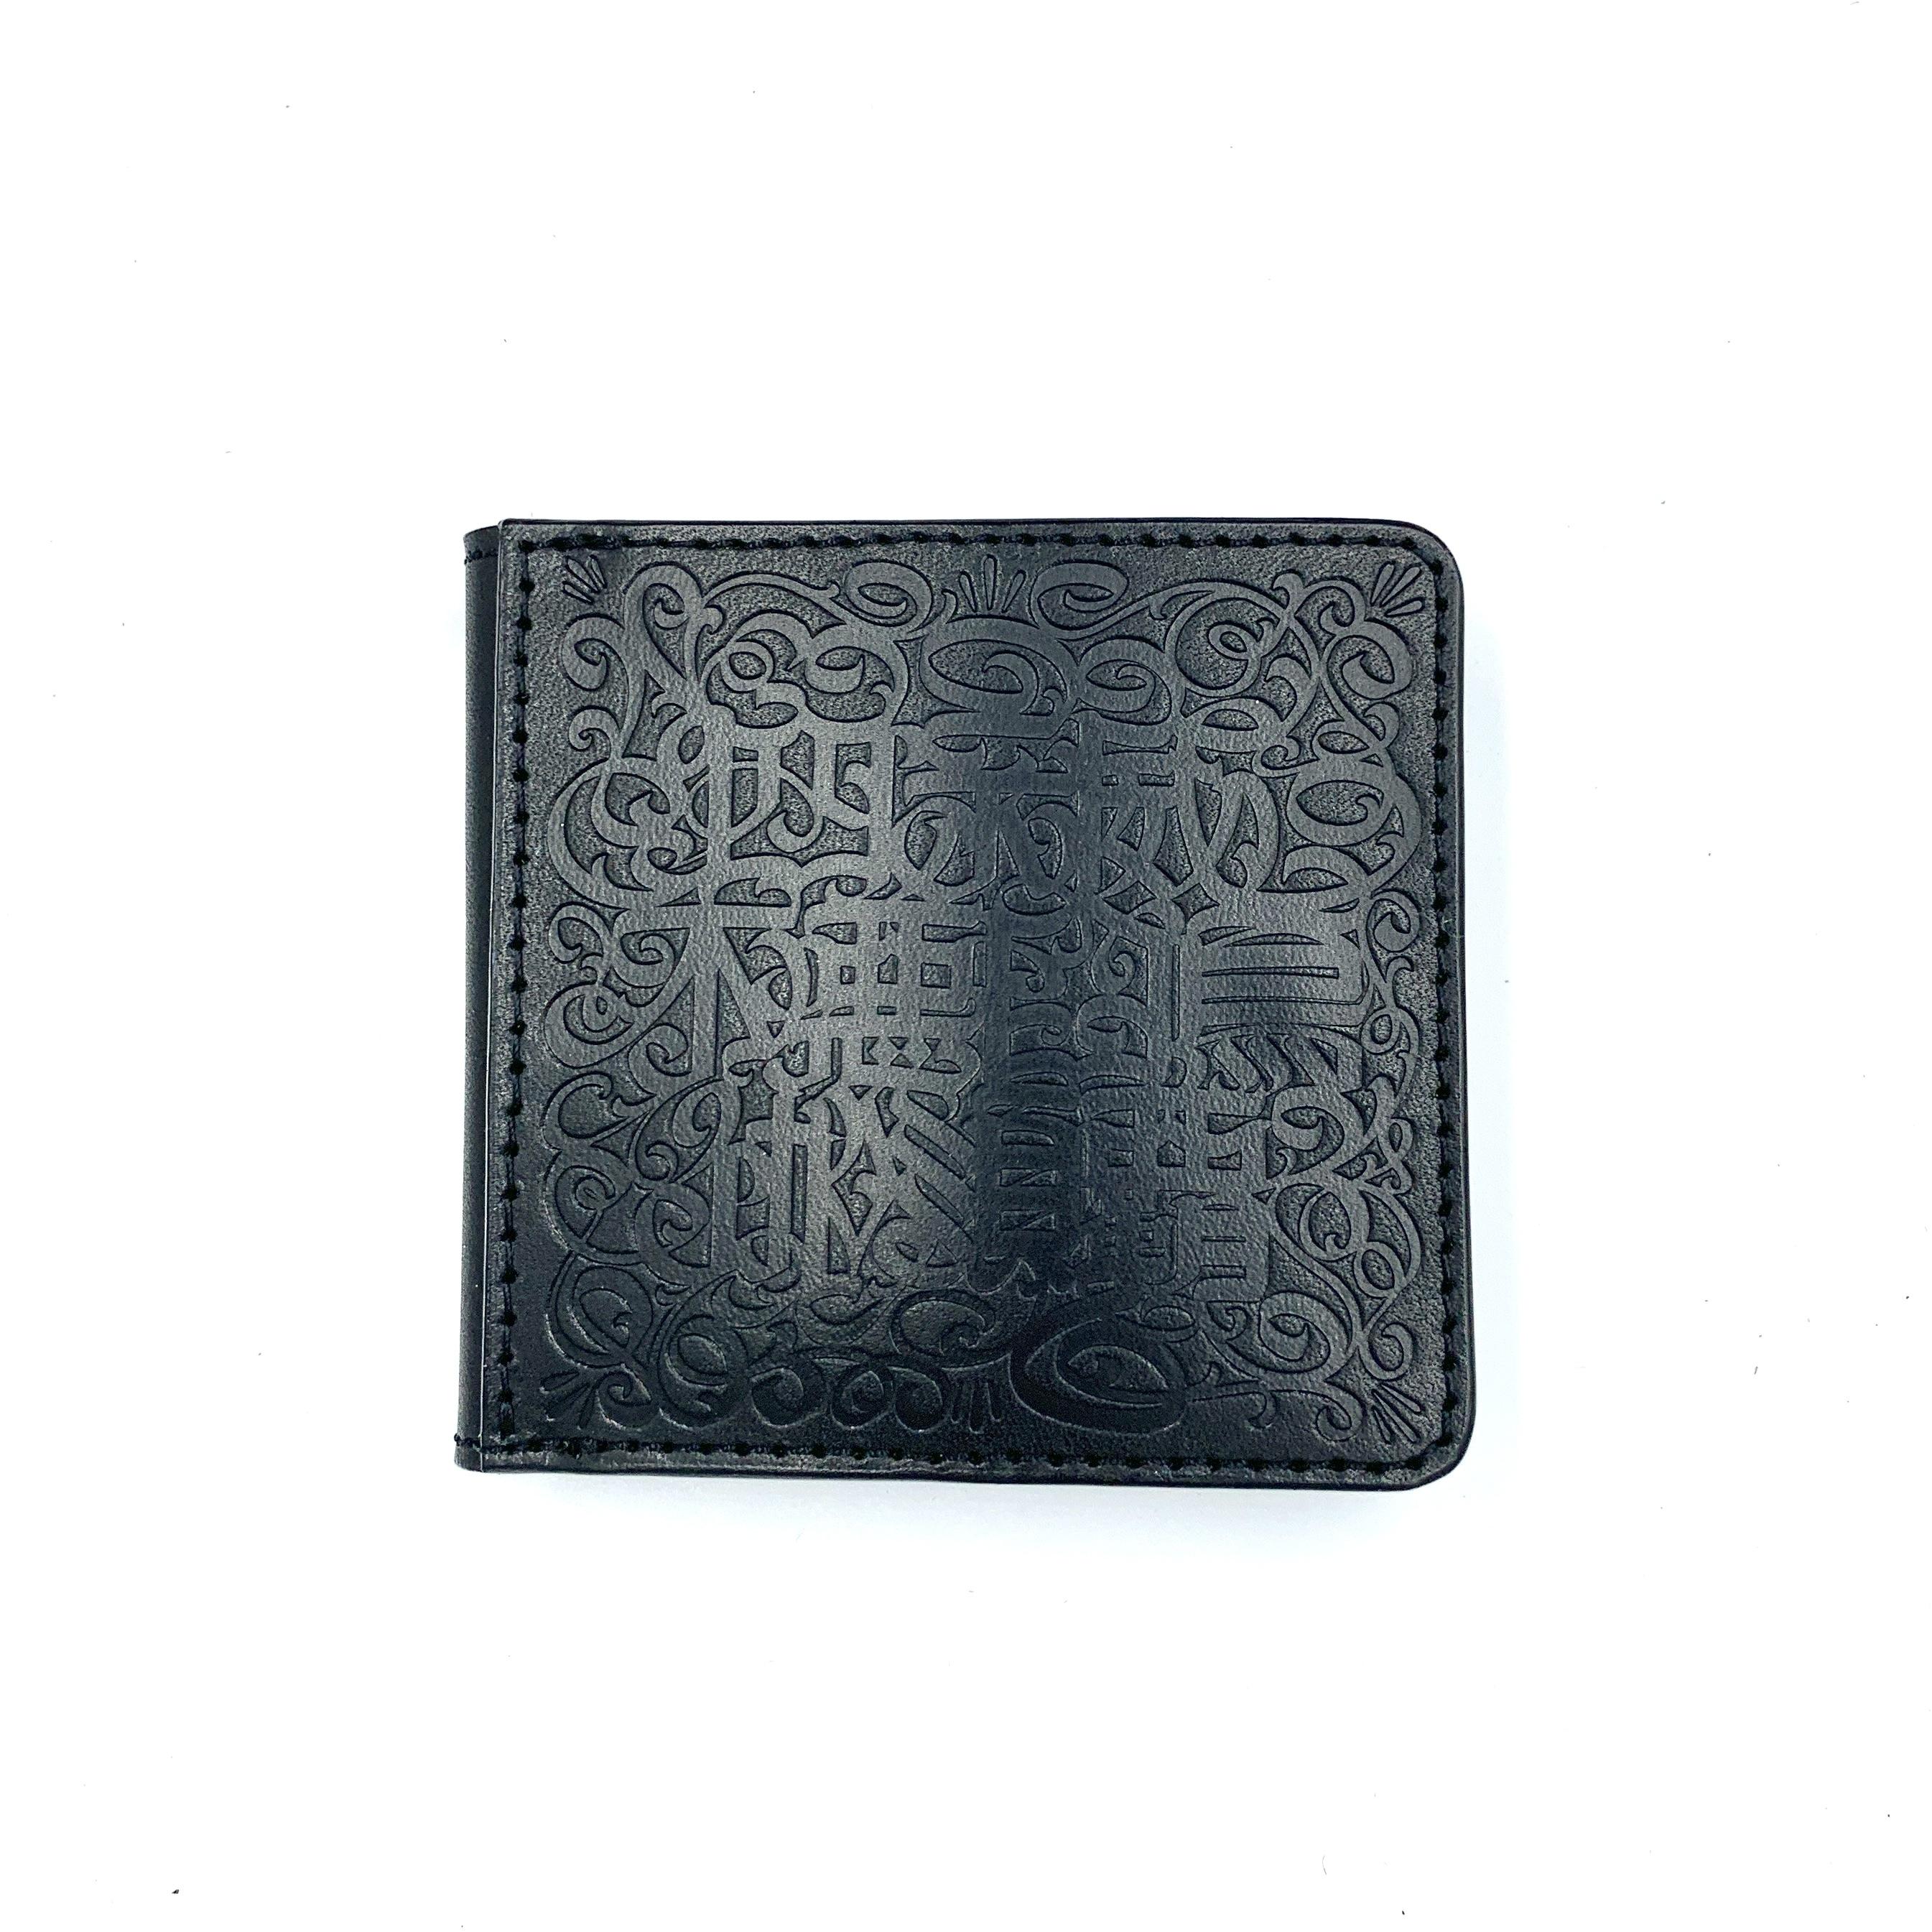 《CASPER× YONZY factory》BOX小銭入れショート財布 ブラック